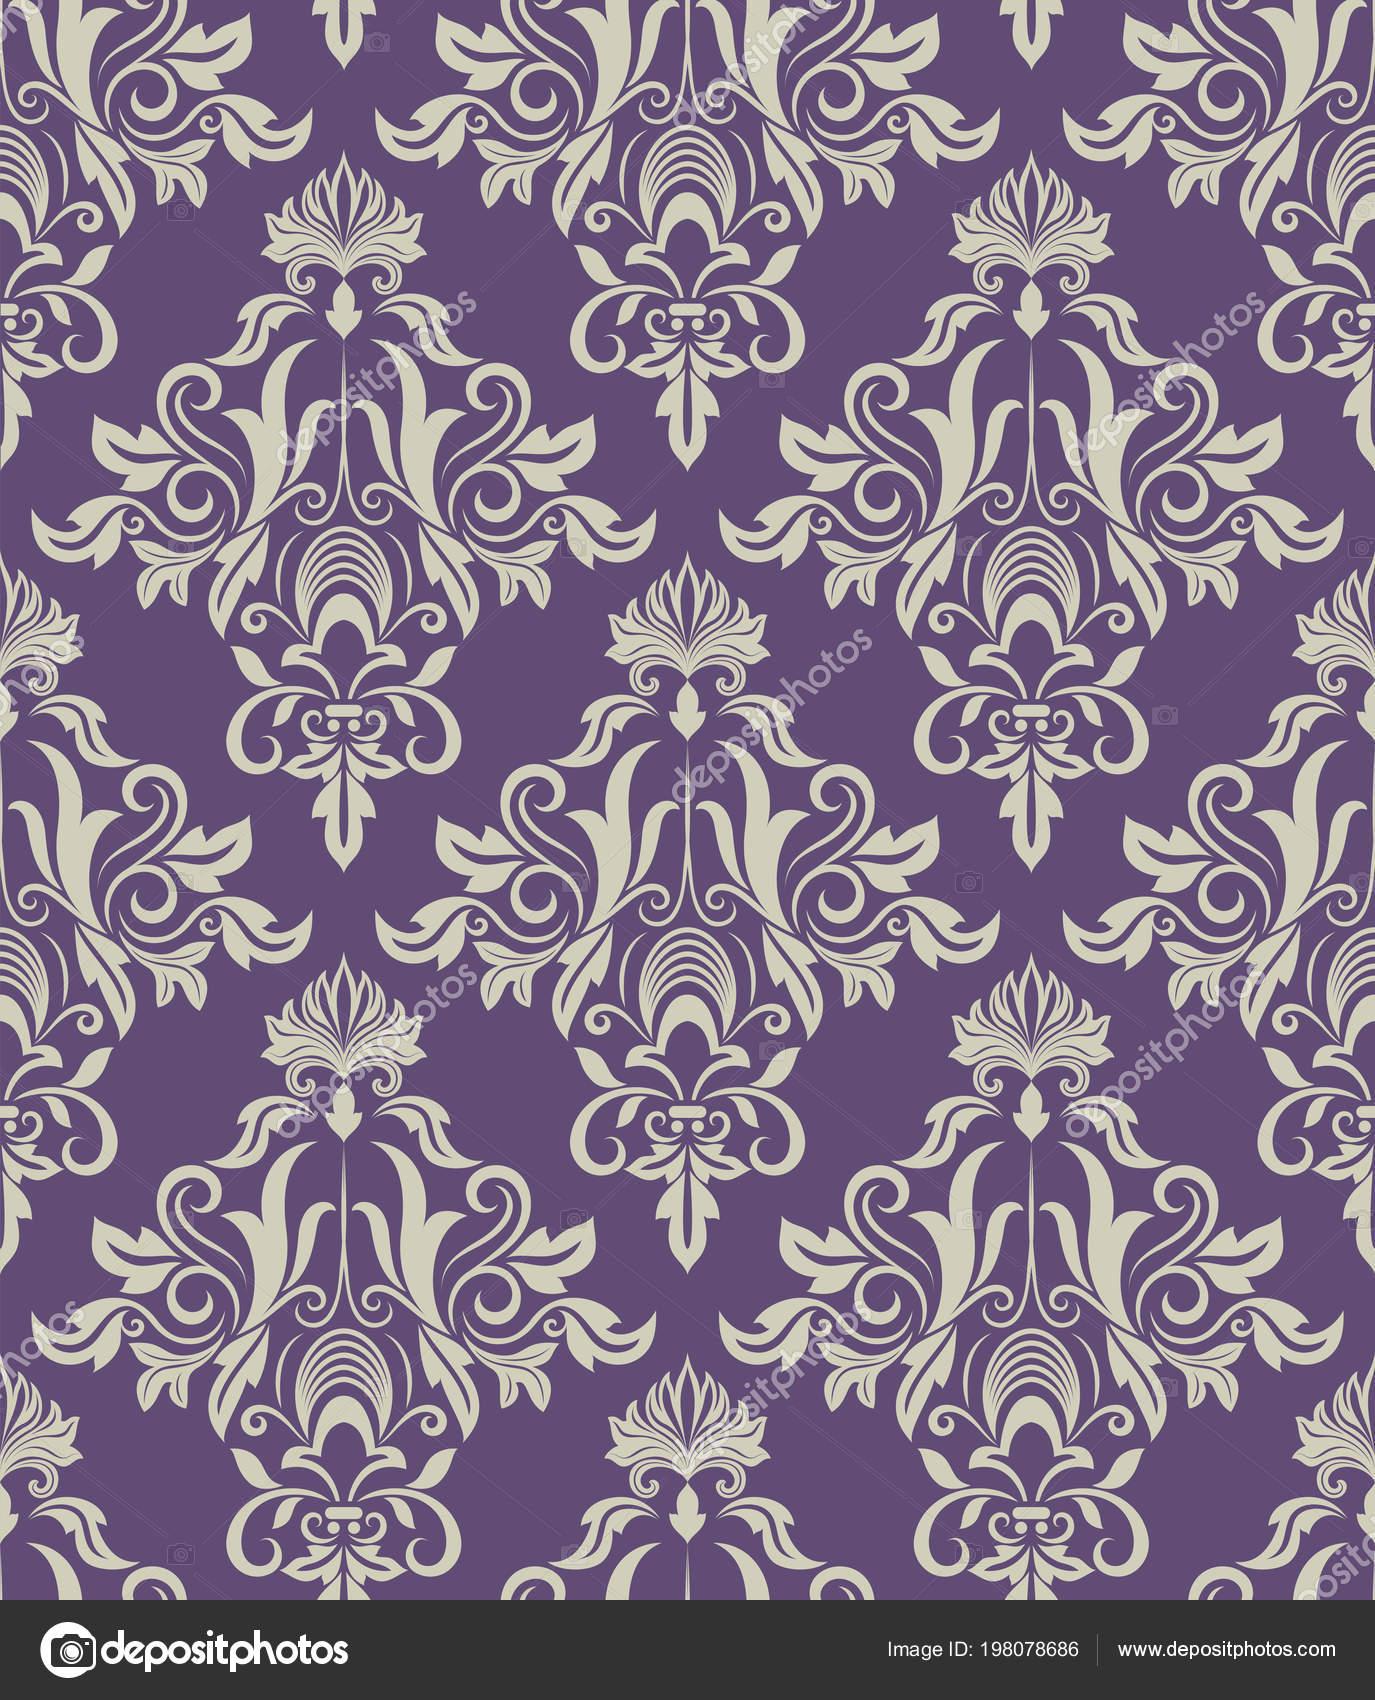 Dark Purple And Beige Vintage Wallpaper Pattern Vector Illustration By Lenapix